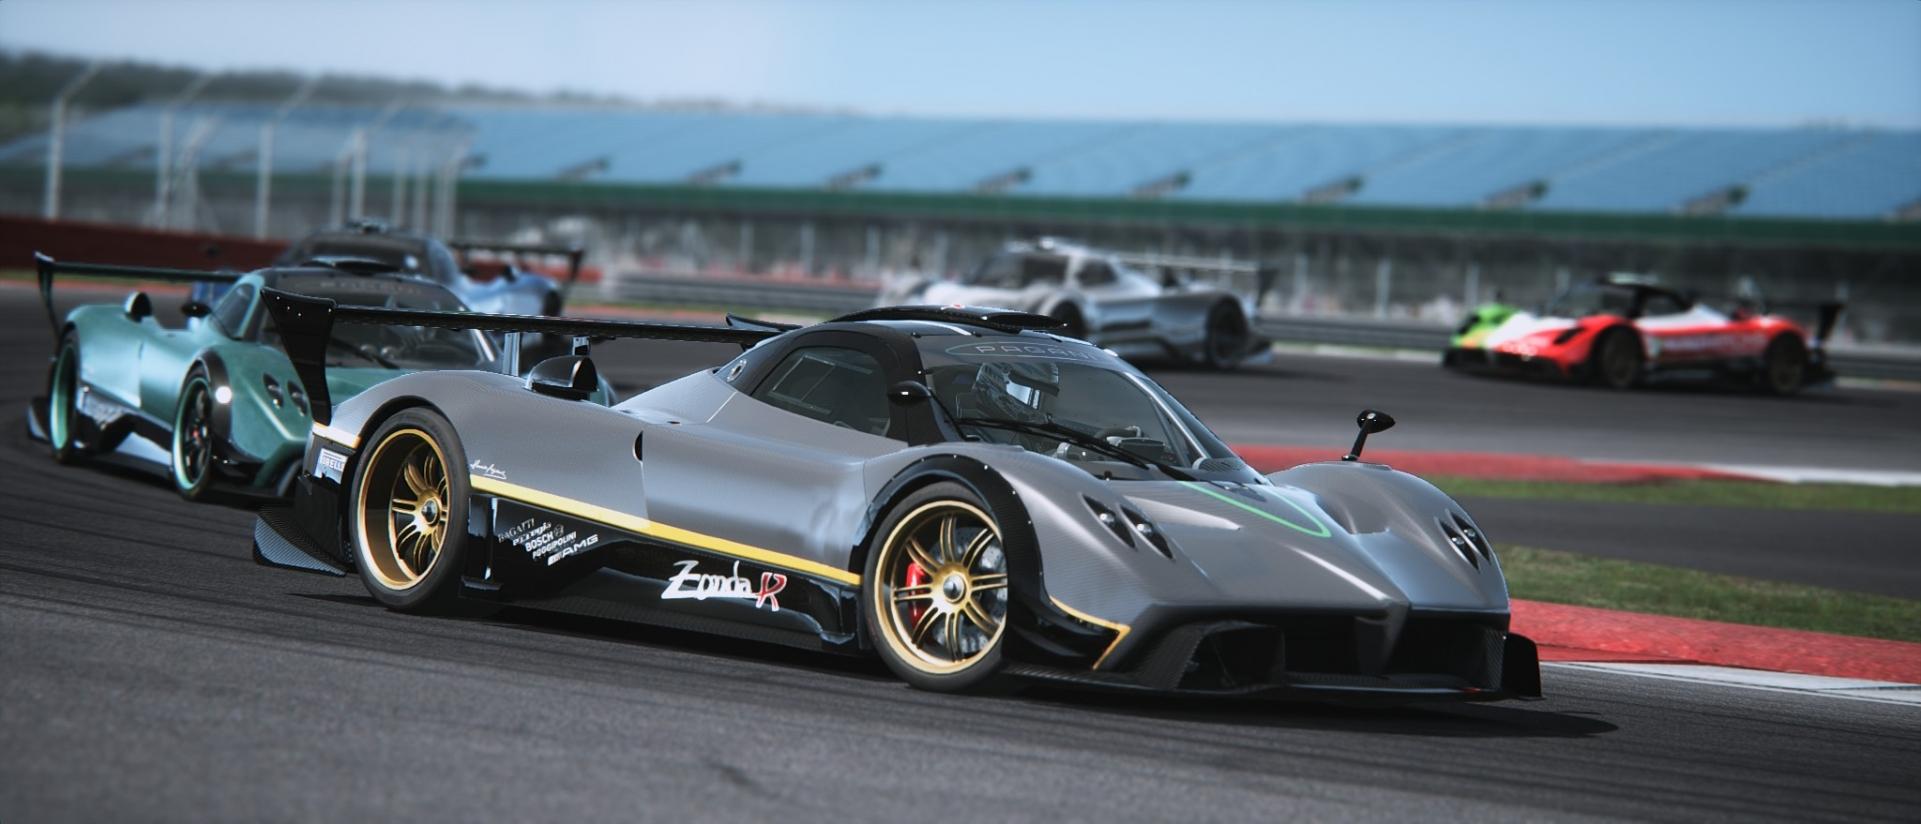 Assetto Corsa - Pagani Zonda Silverstone 03